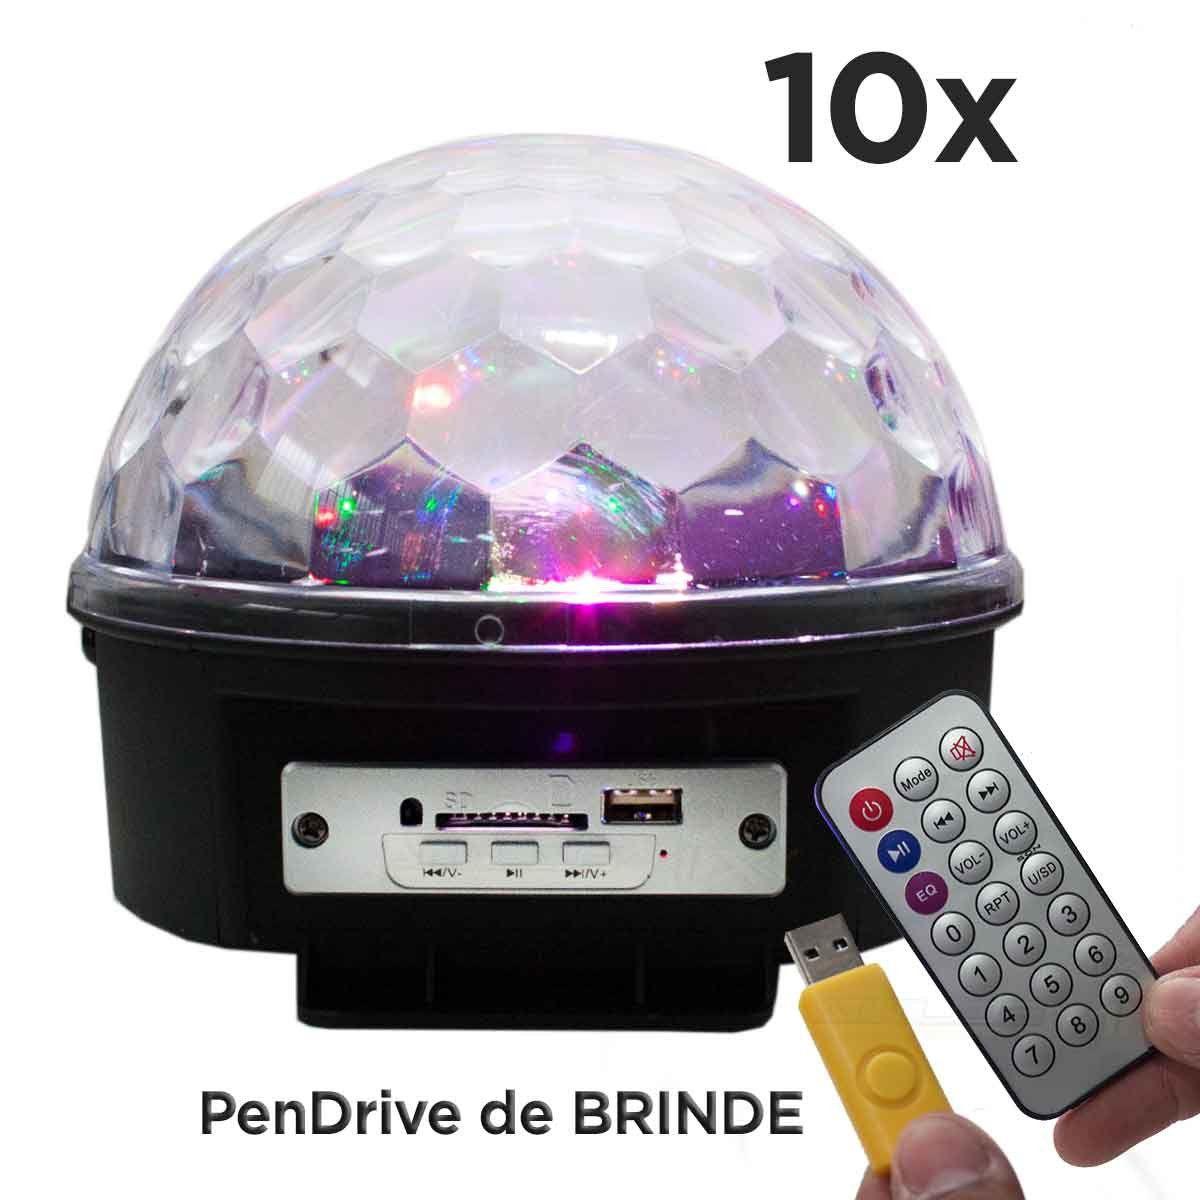 10xGlobo Bola Maluca Led Magic De Cristal Rgb 30w Festas